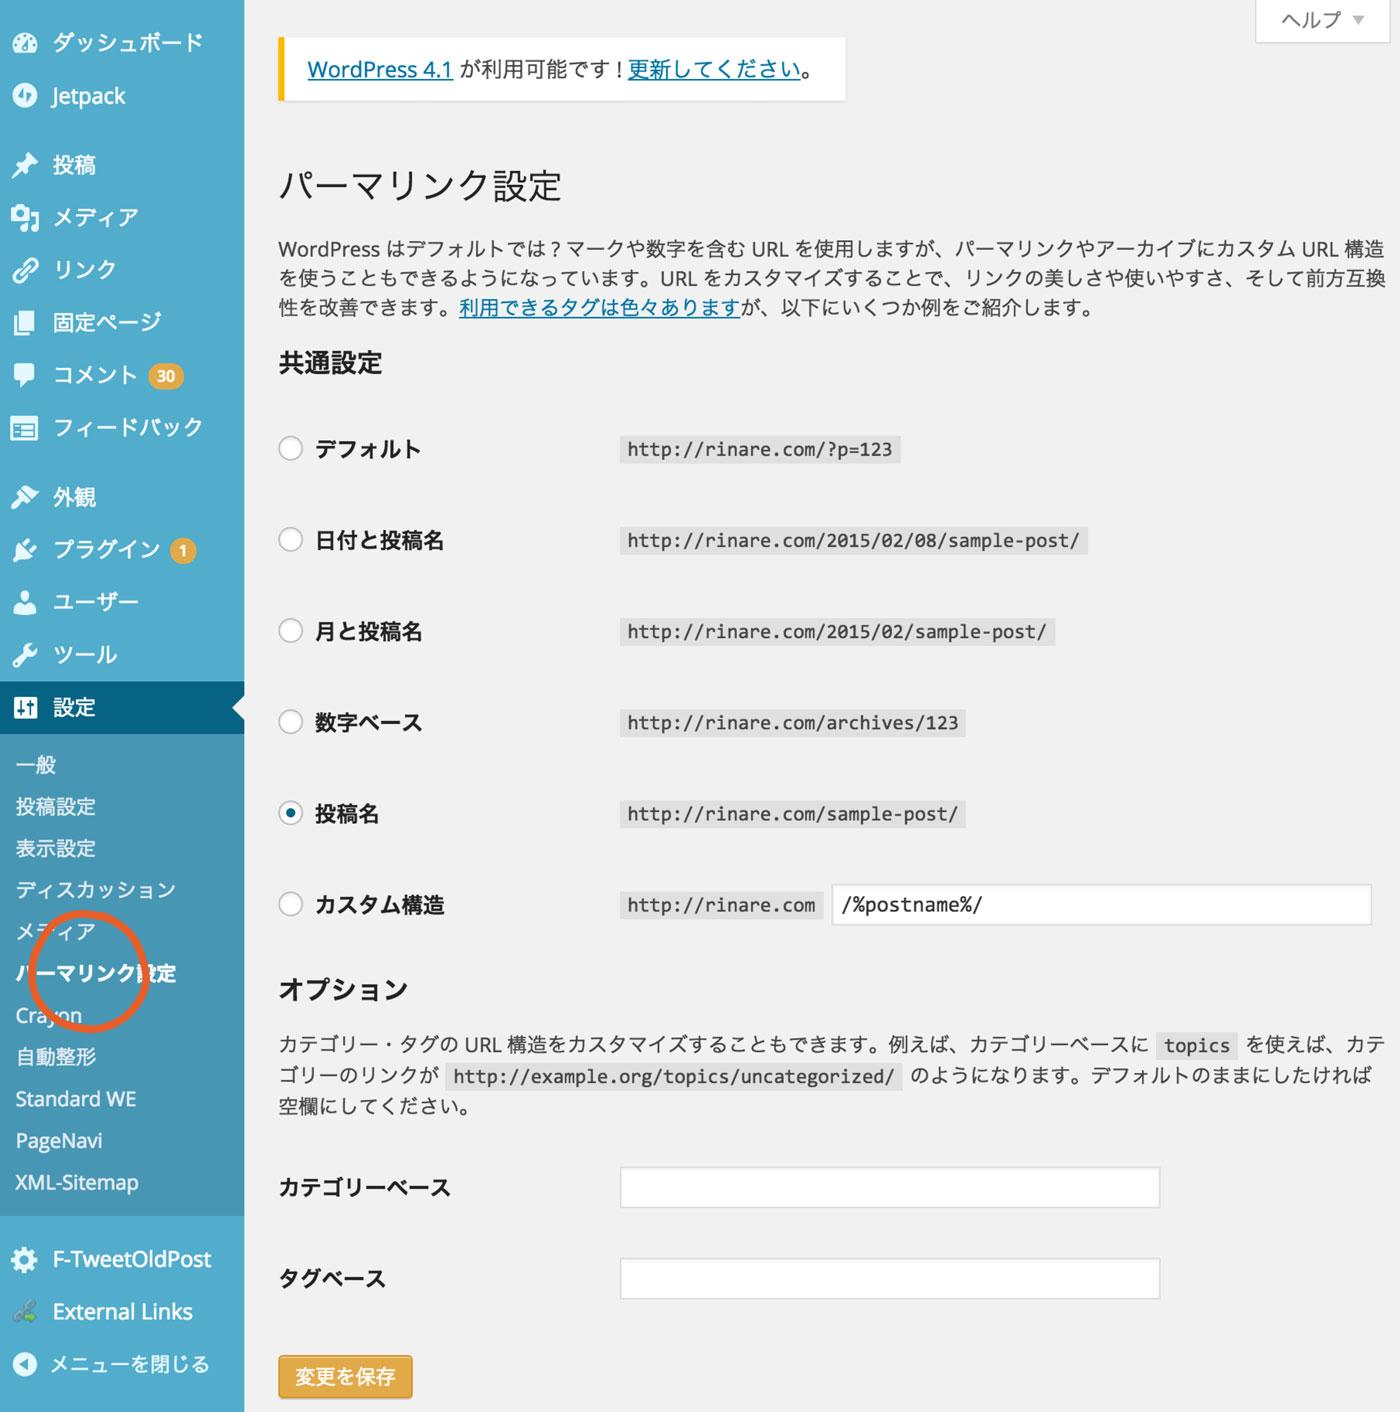 WordPressのパーマリンクの設定画面